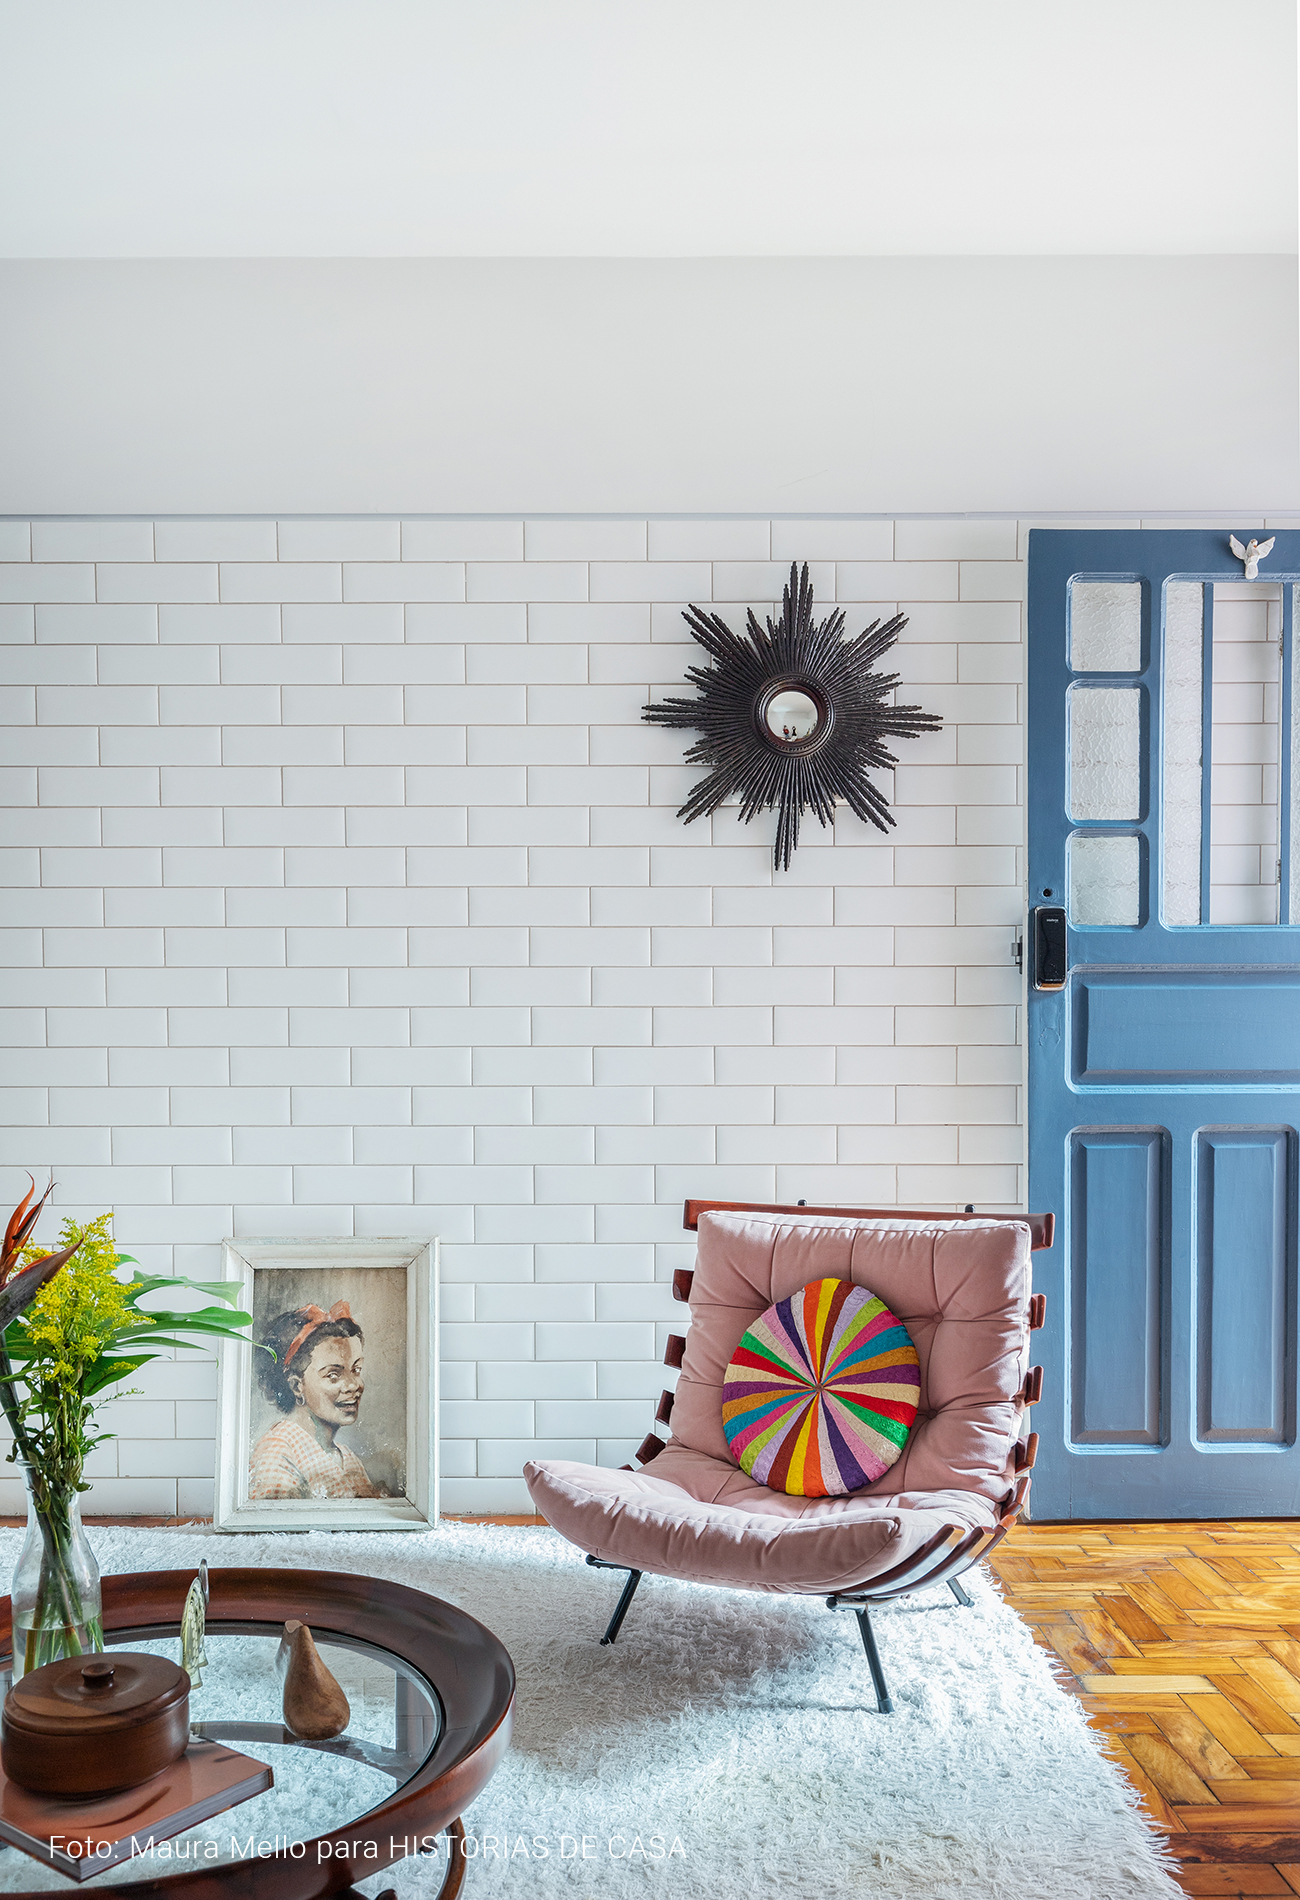 Apartamento térreo sala de estar detalhes coloridos